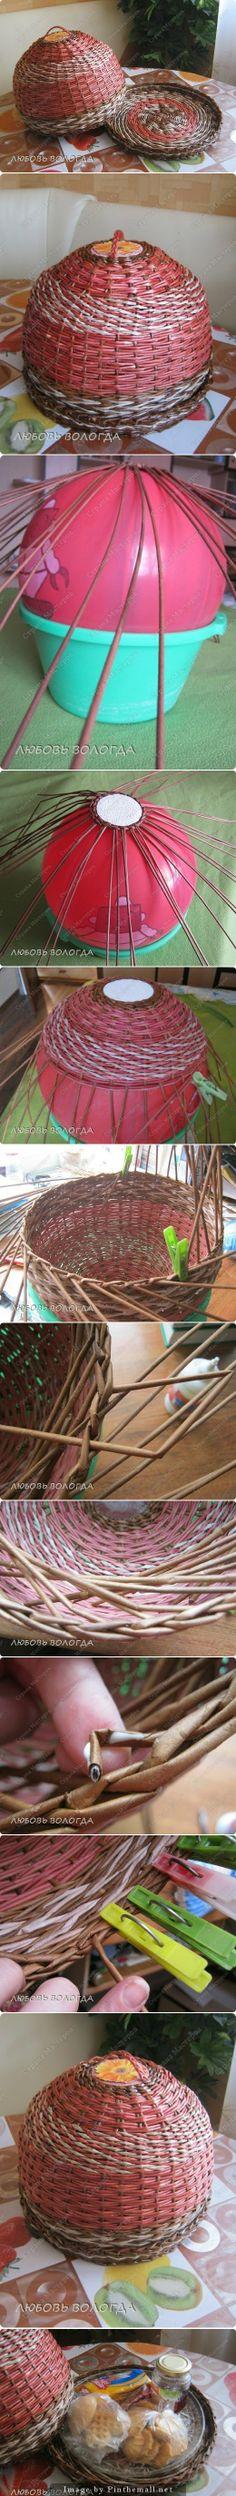 Panera con tapa - created via http://pinthemall.net